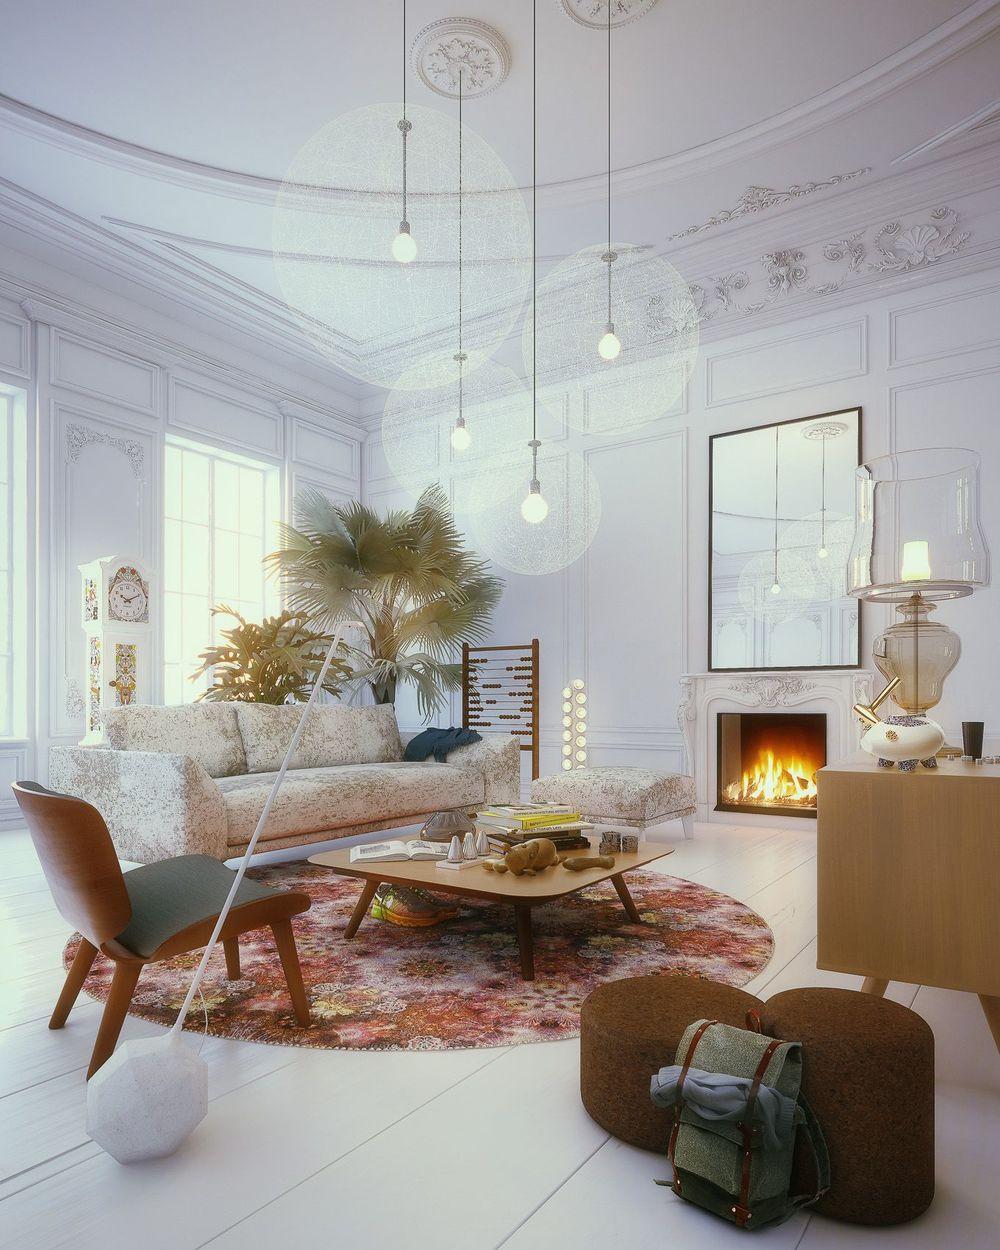 interior-rendering-03b-forweb-moooi_0.jpg